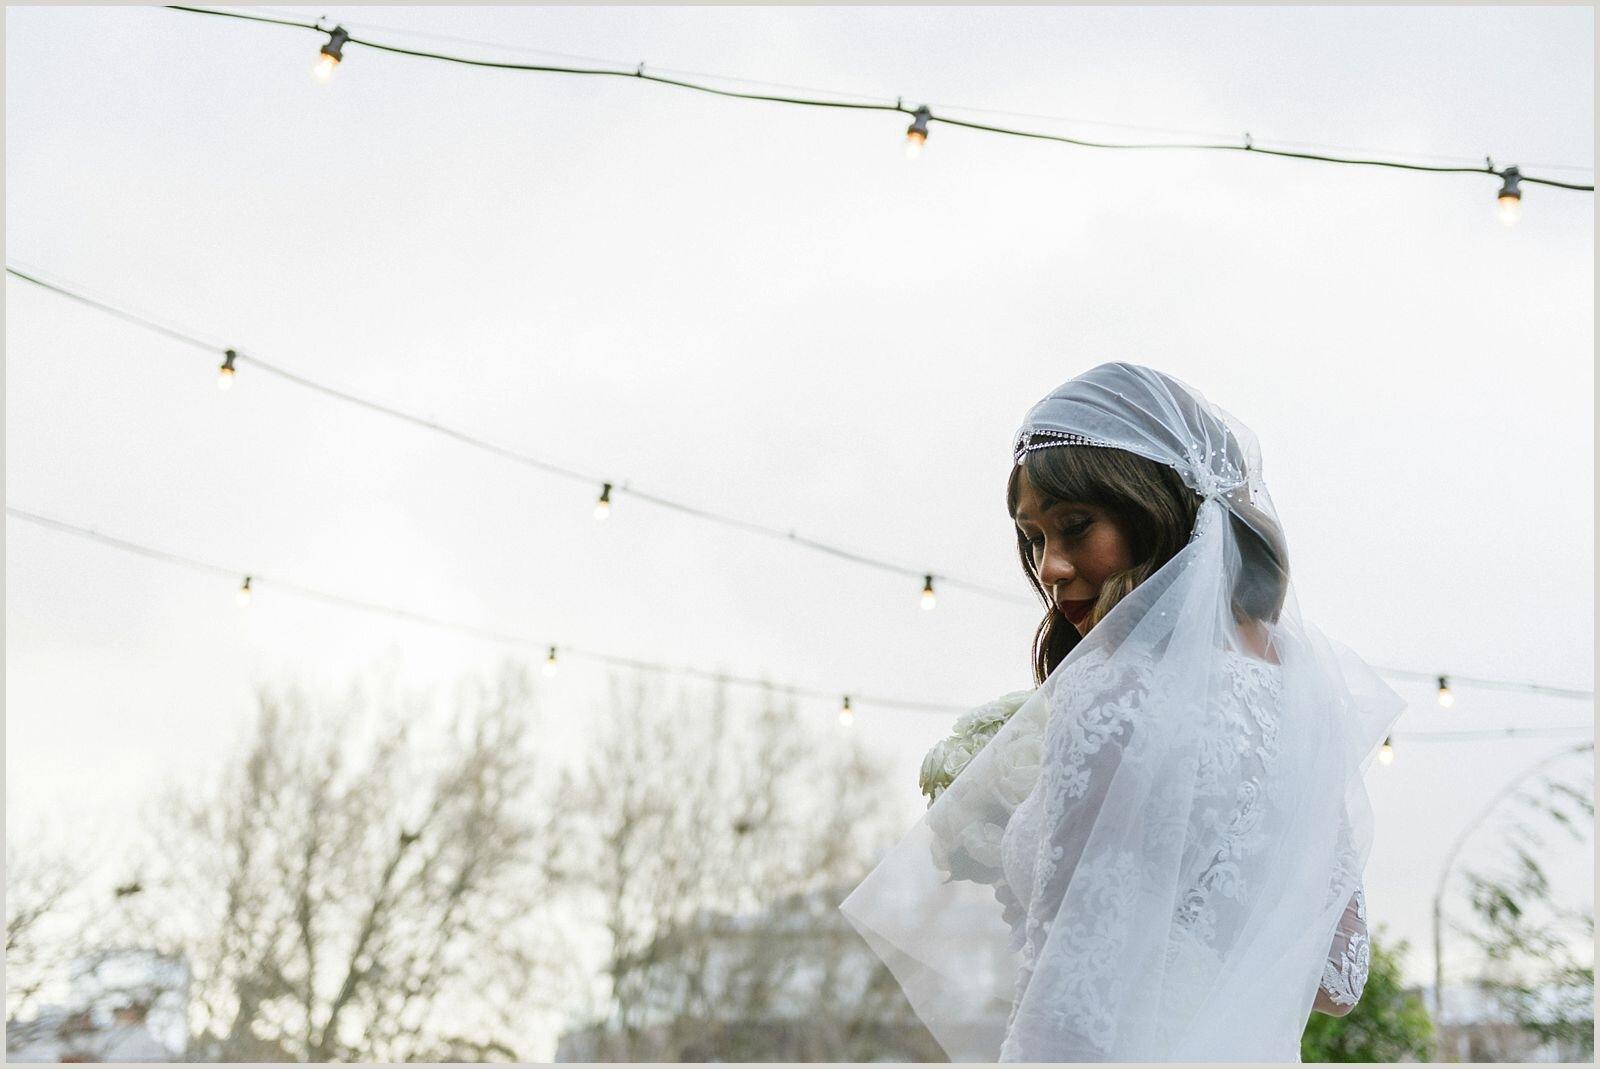 joseph_koprek_wedding_melbourne_the_prince_deck_0041.jpg